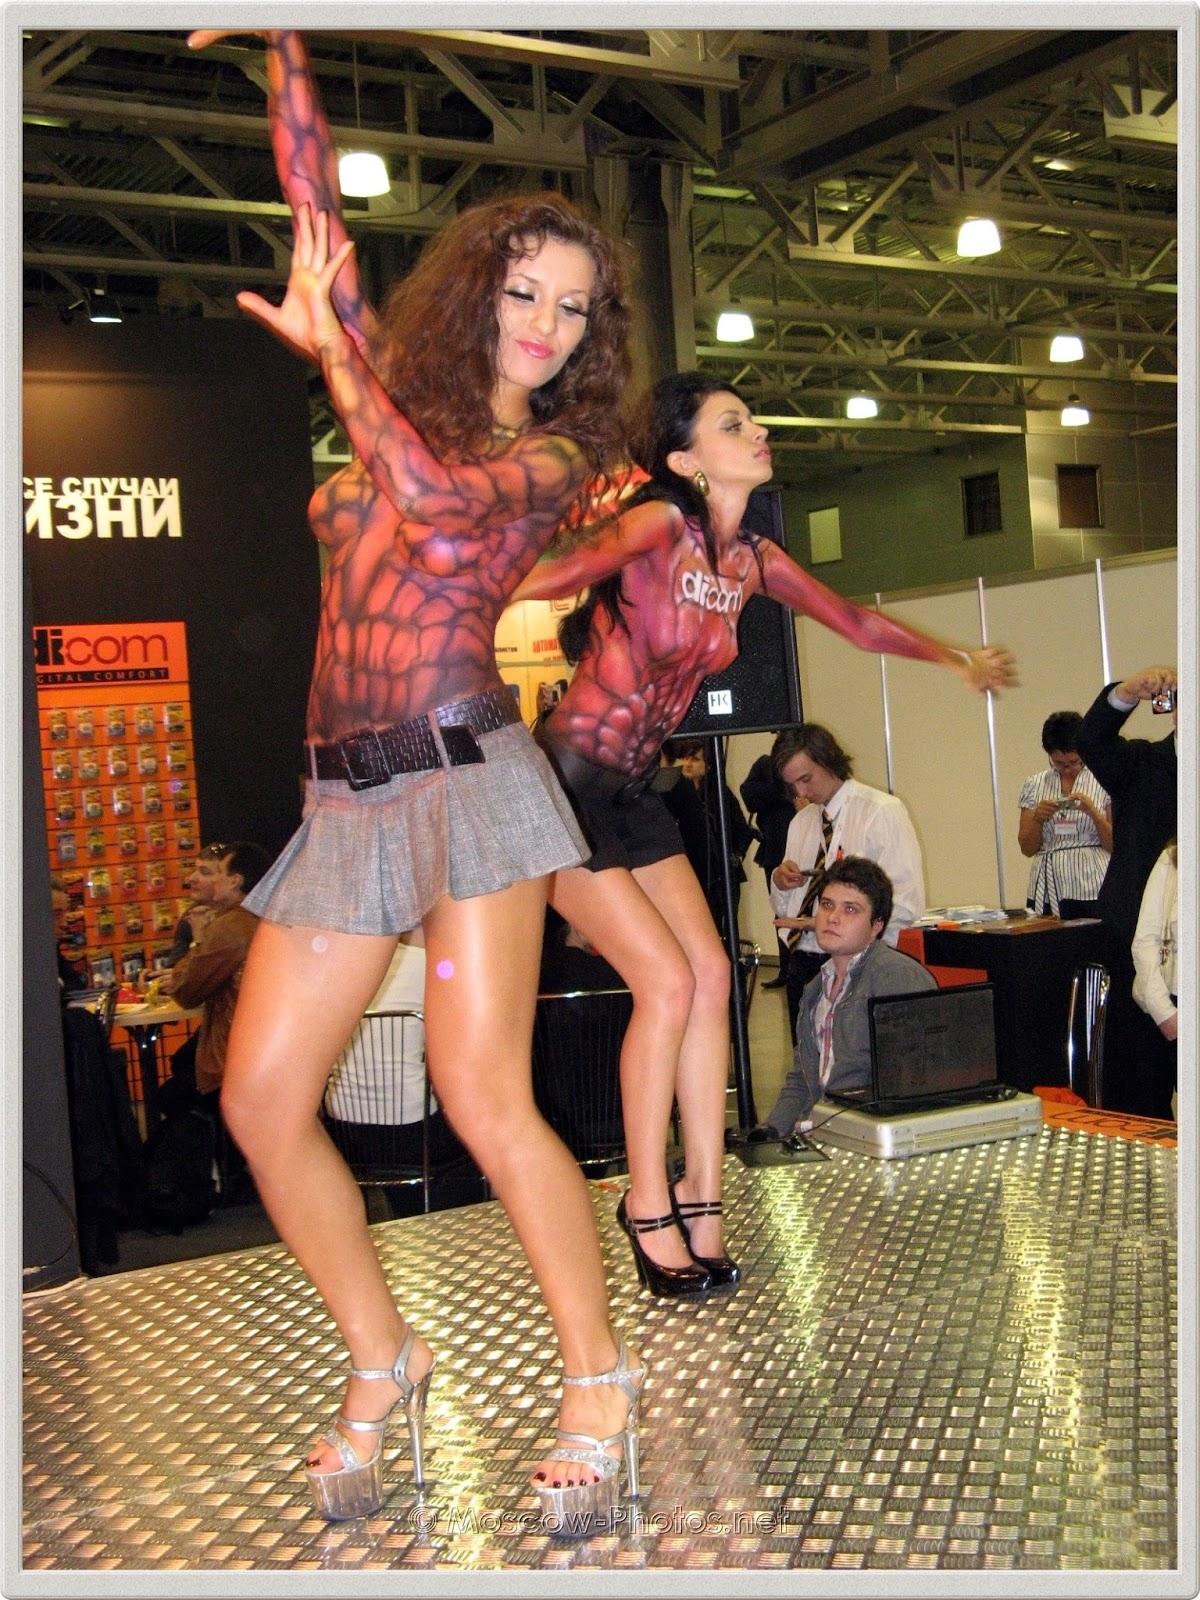 Dancing body painted girls on high heels. Photoforum - 2008.